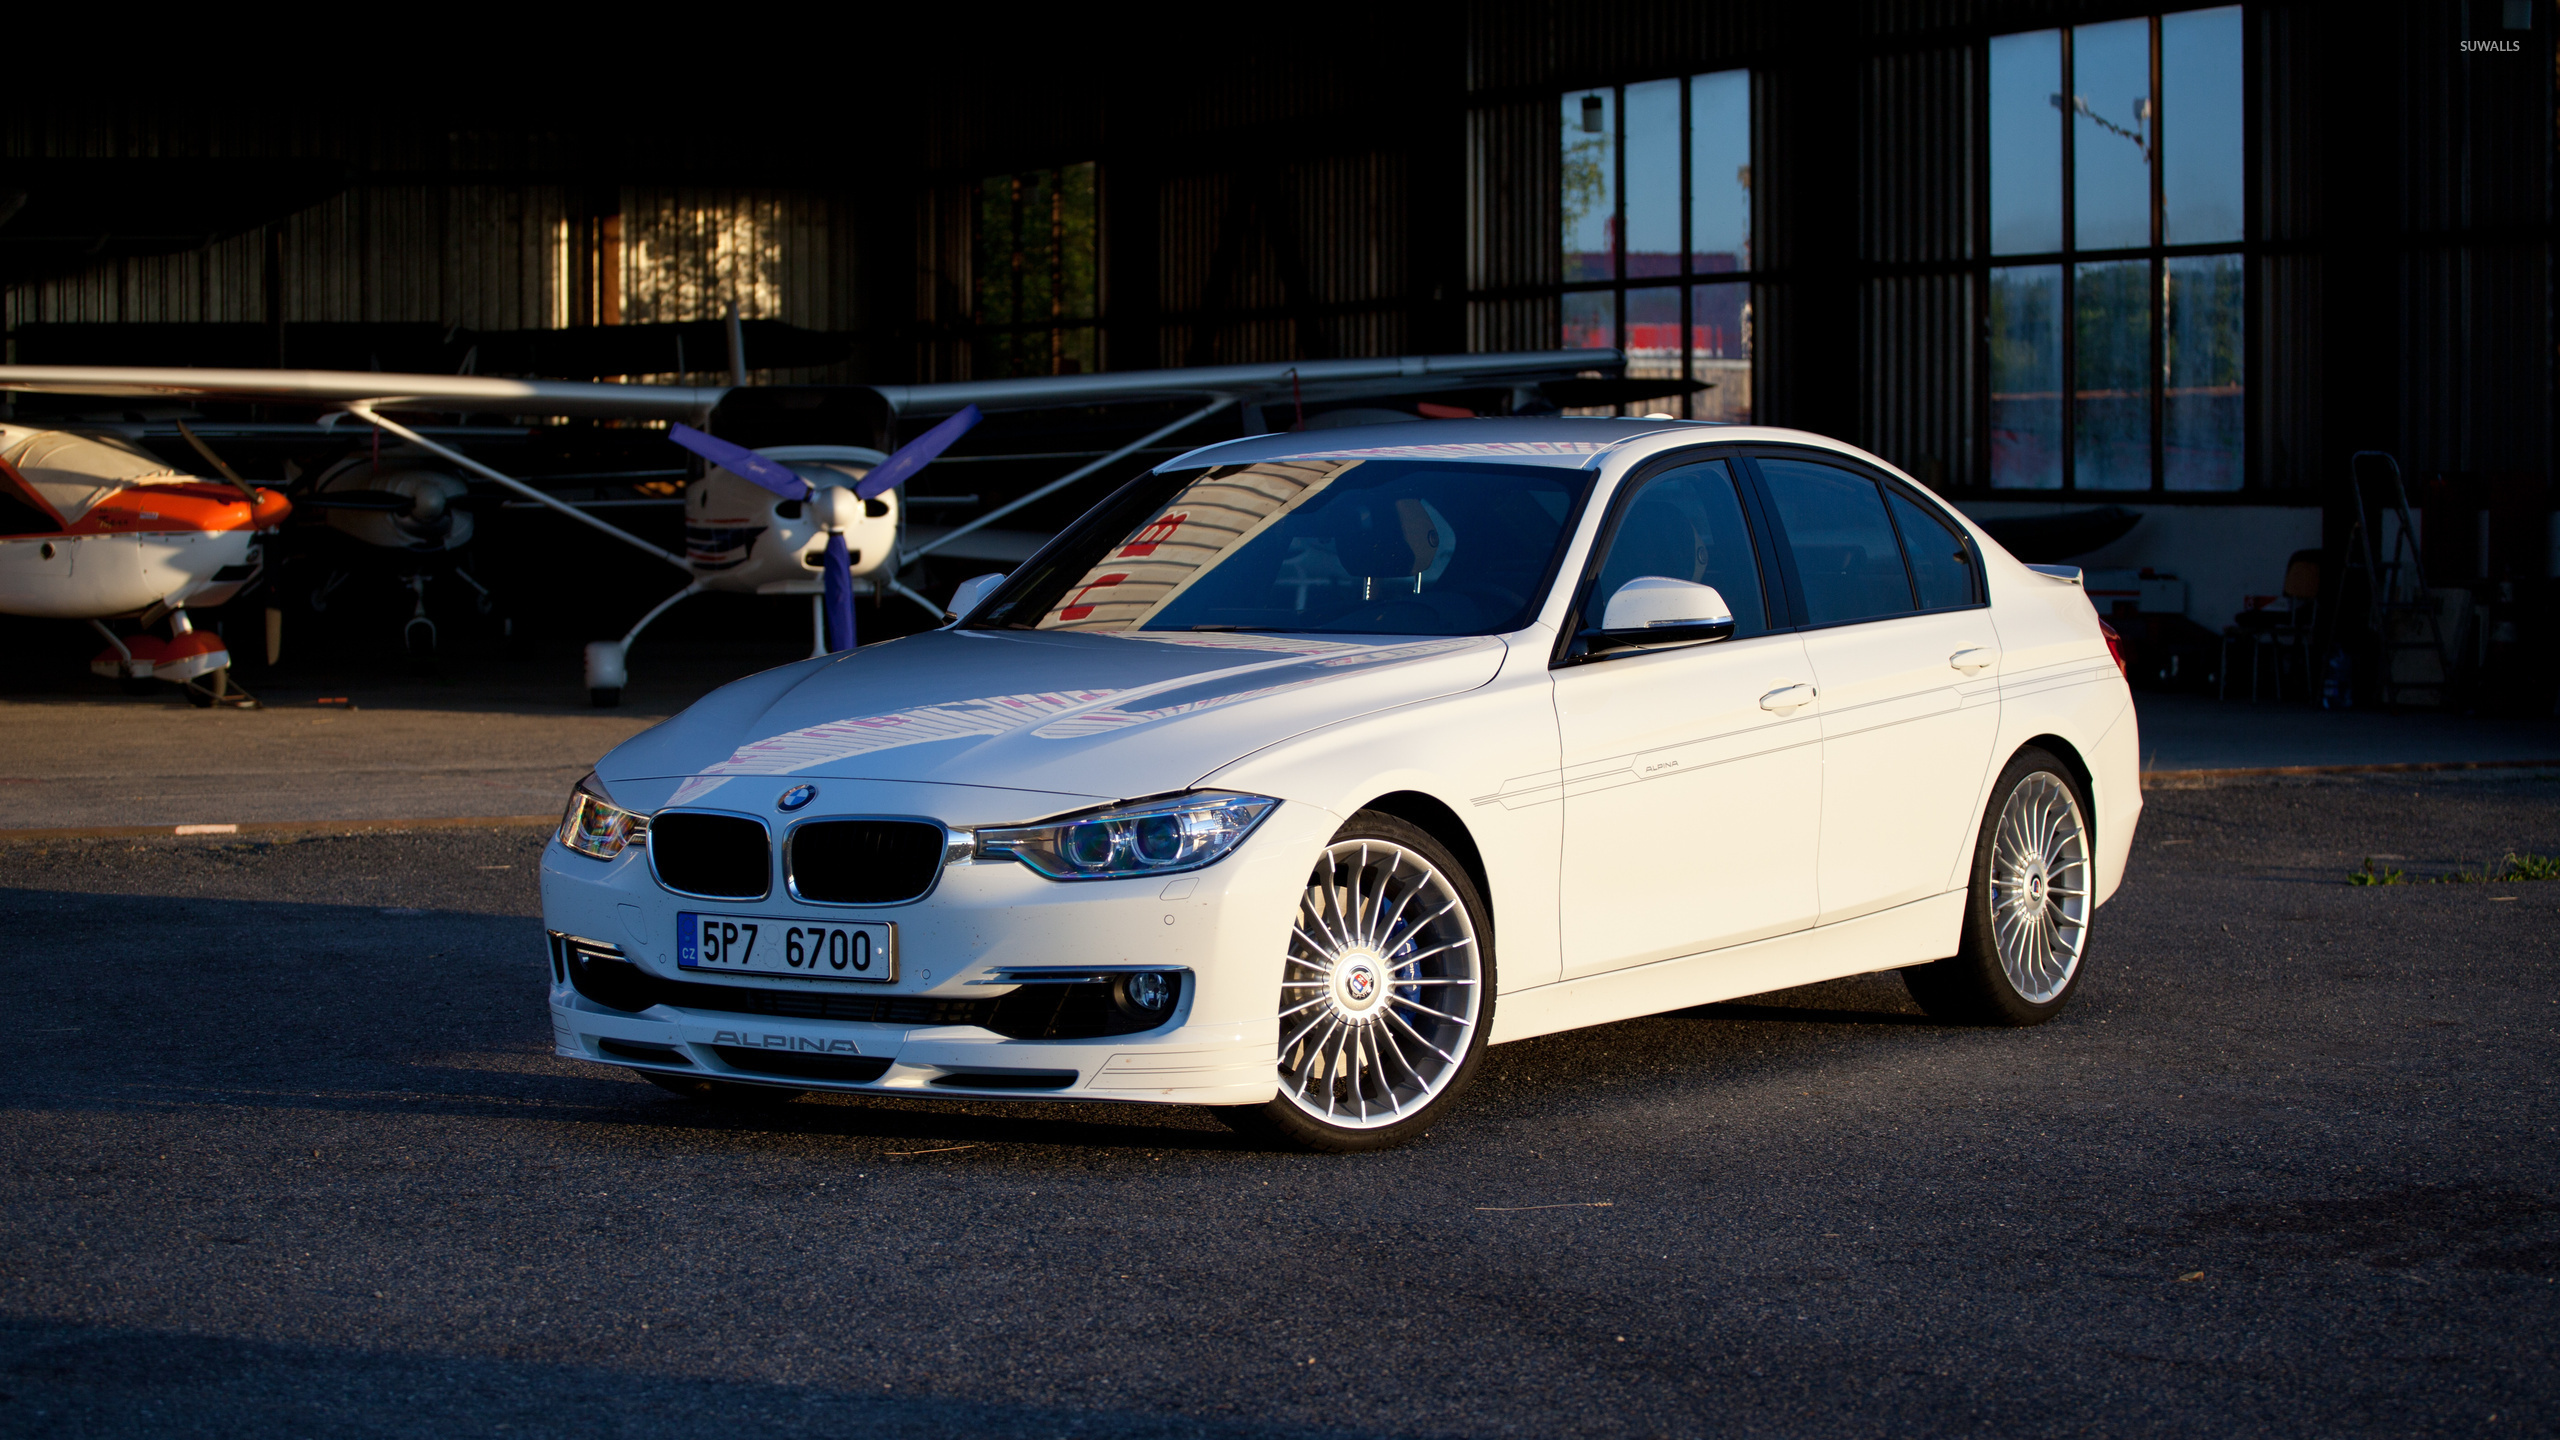 White Alpina BMW 3 Series wallpaper - Car wallpapers - #53385